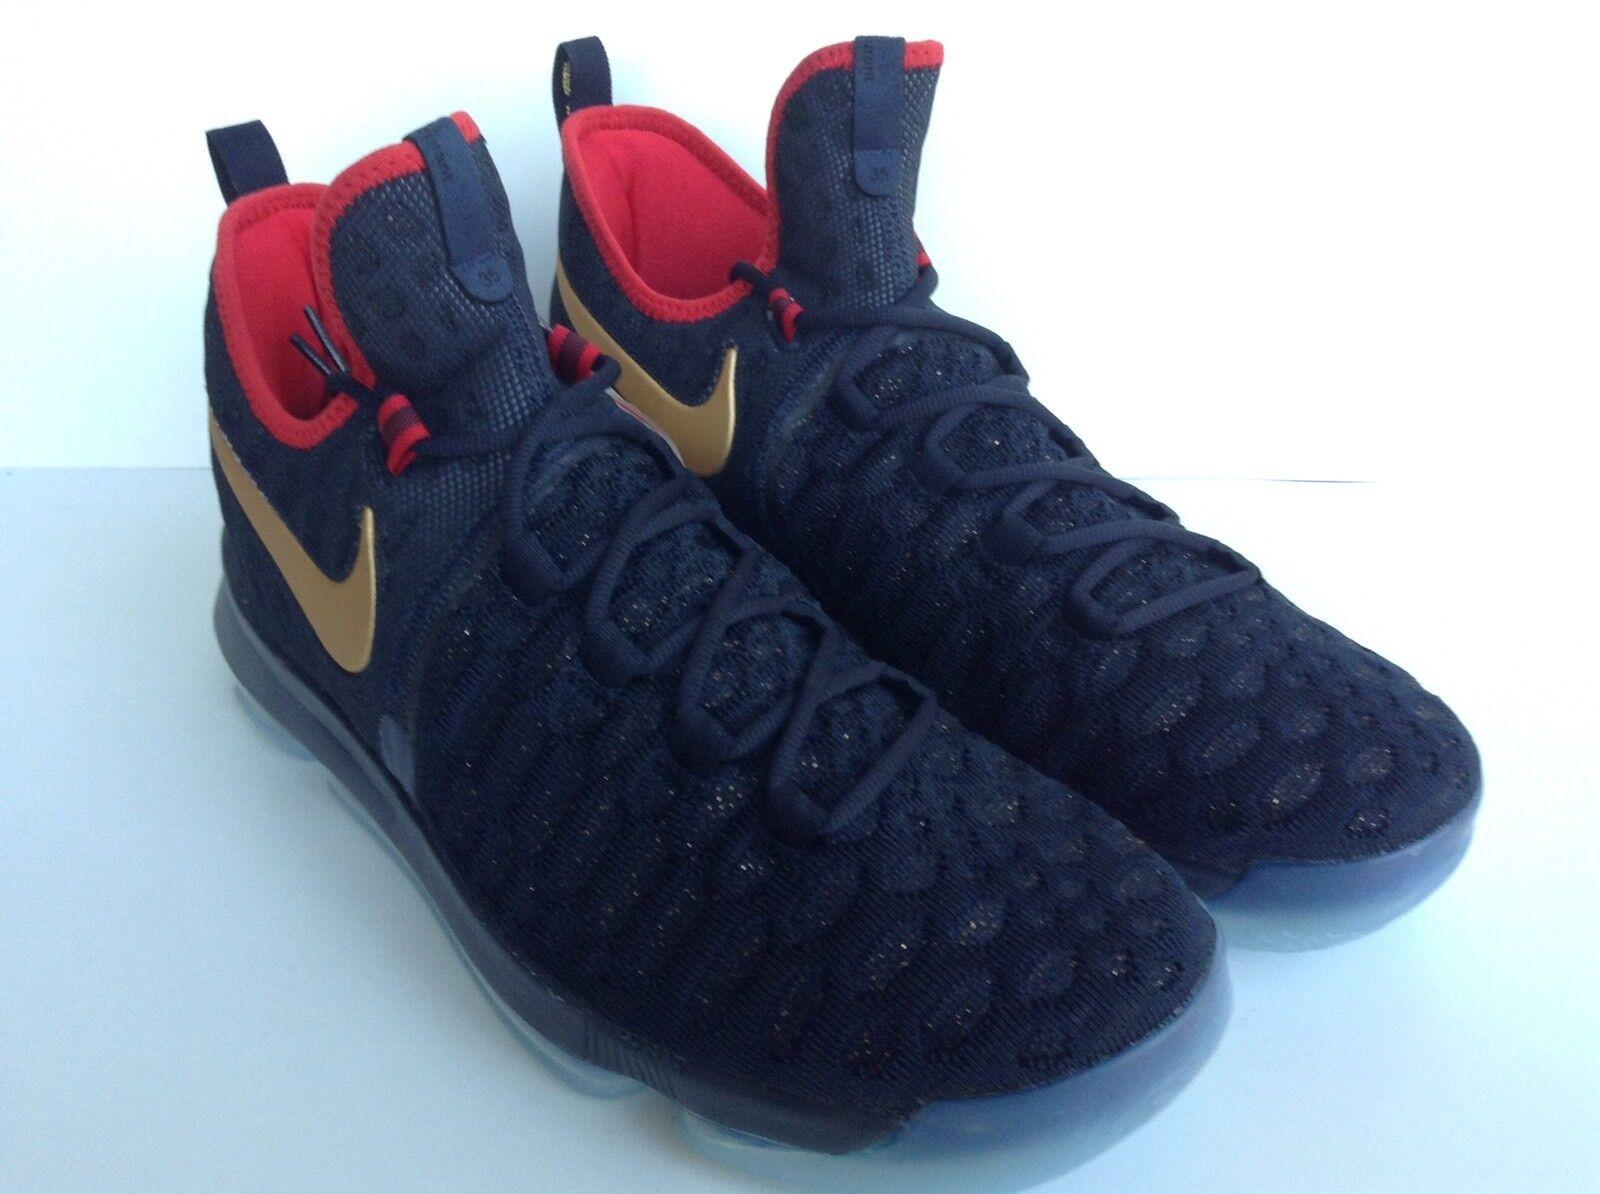 1cb7eedd3878 Nike Zoom KD 9 Lmtd(843396-470) Dark Obsidian Metallic Gold USA ...